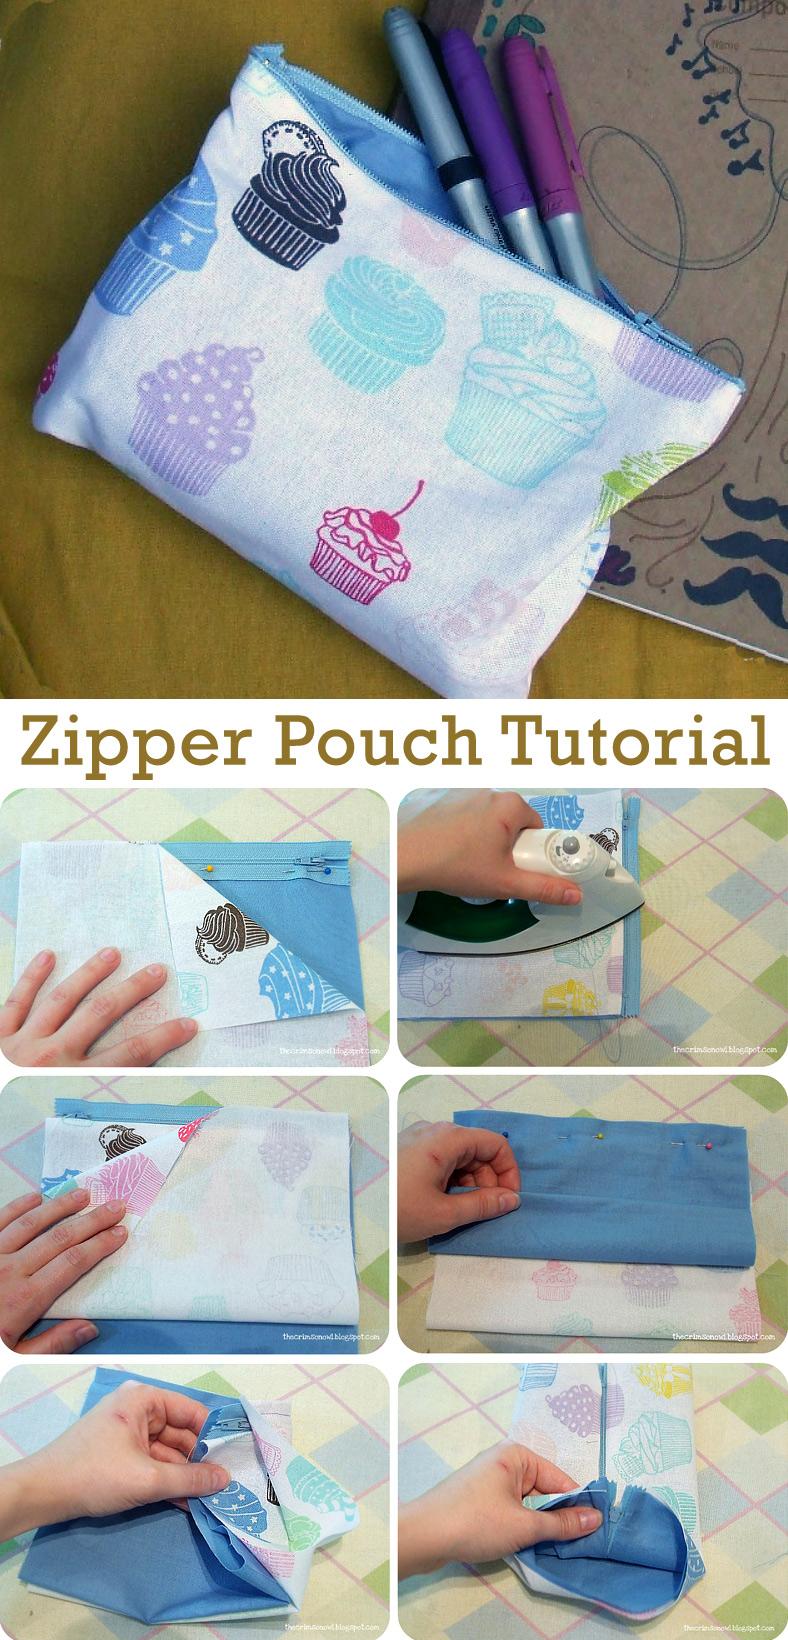 Simple Zipper Pouch Tutorial